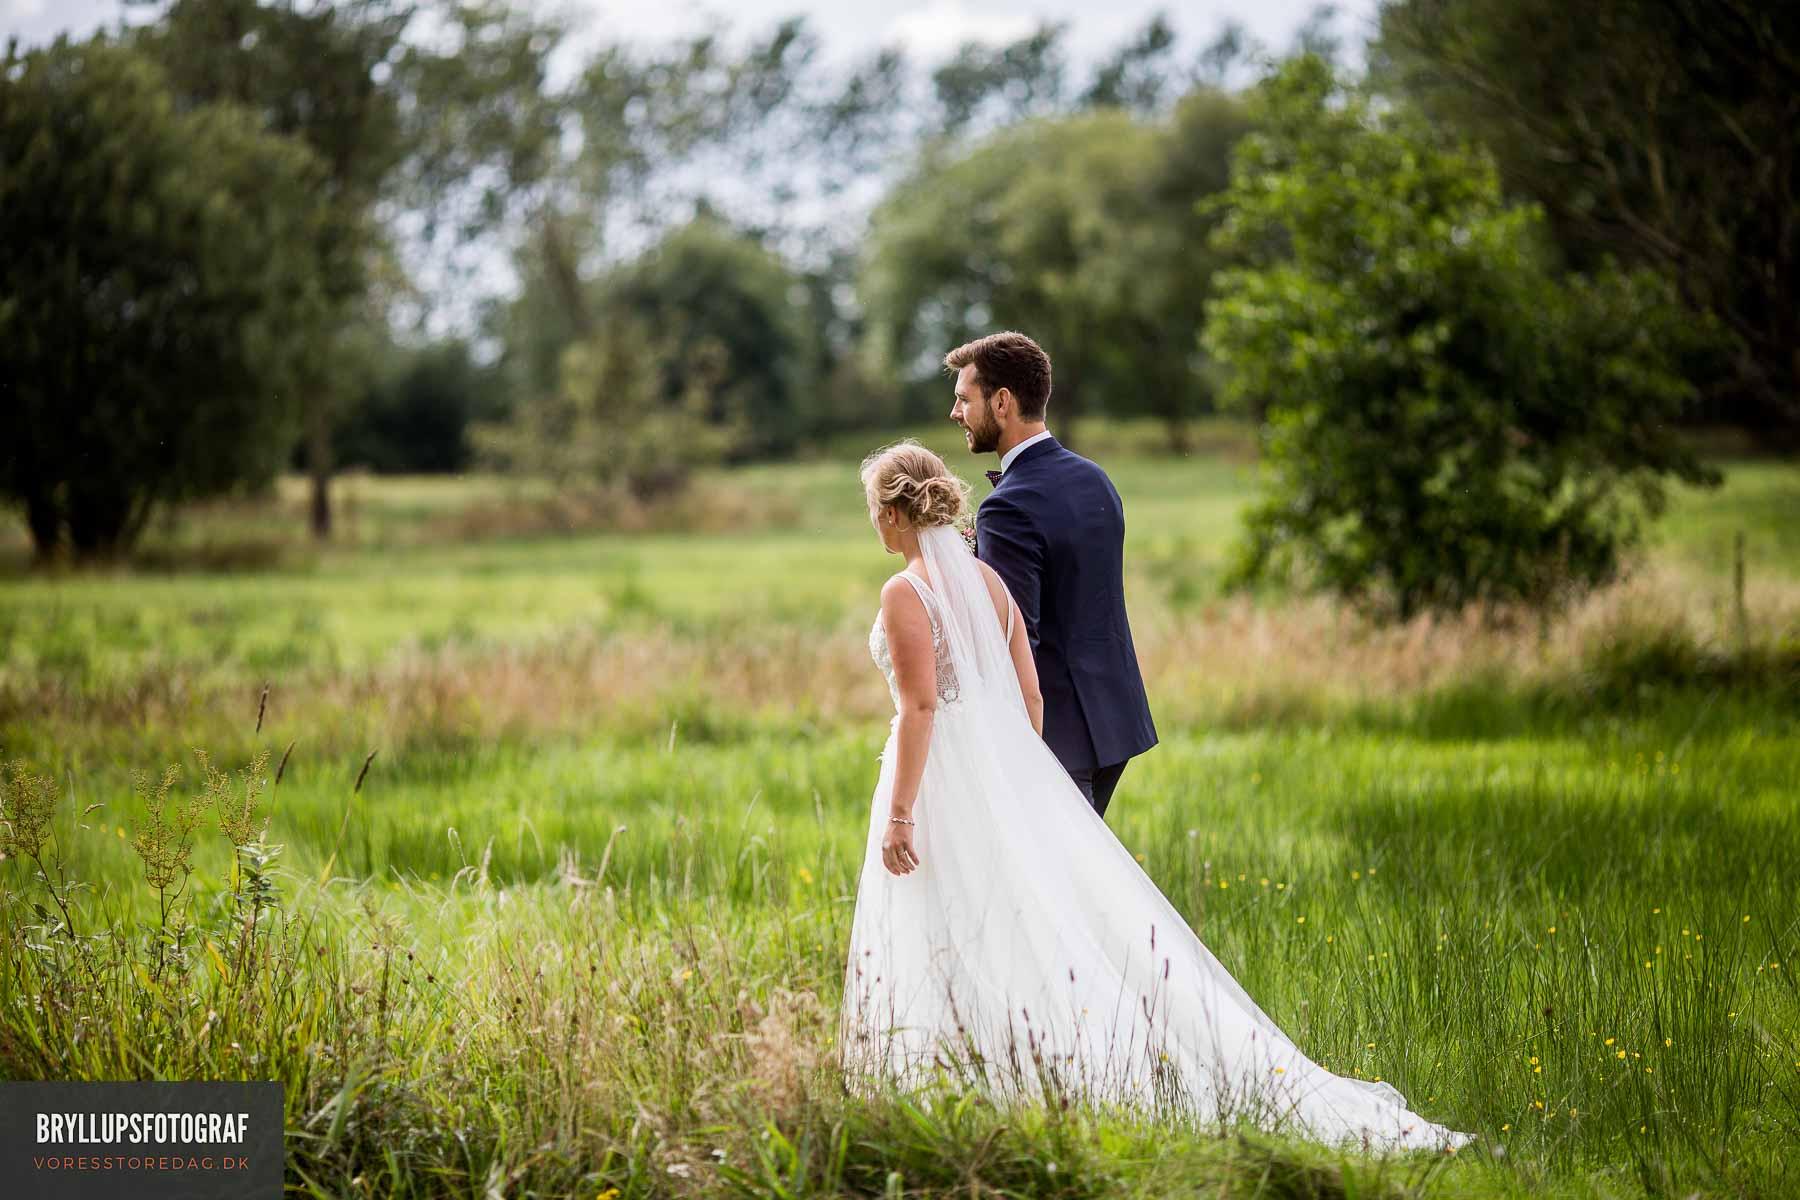 billig bryllupsfotograf midtjylland